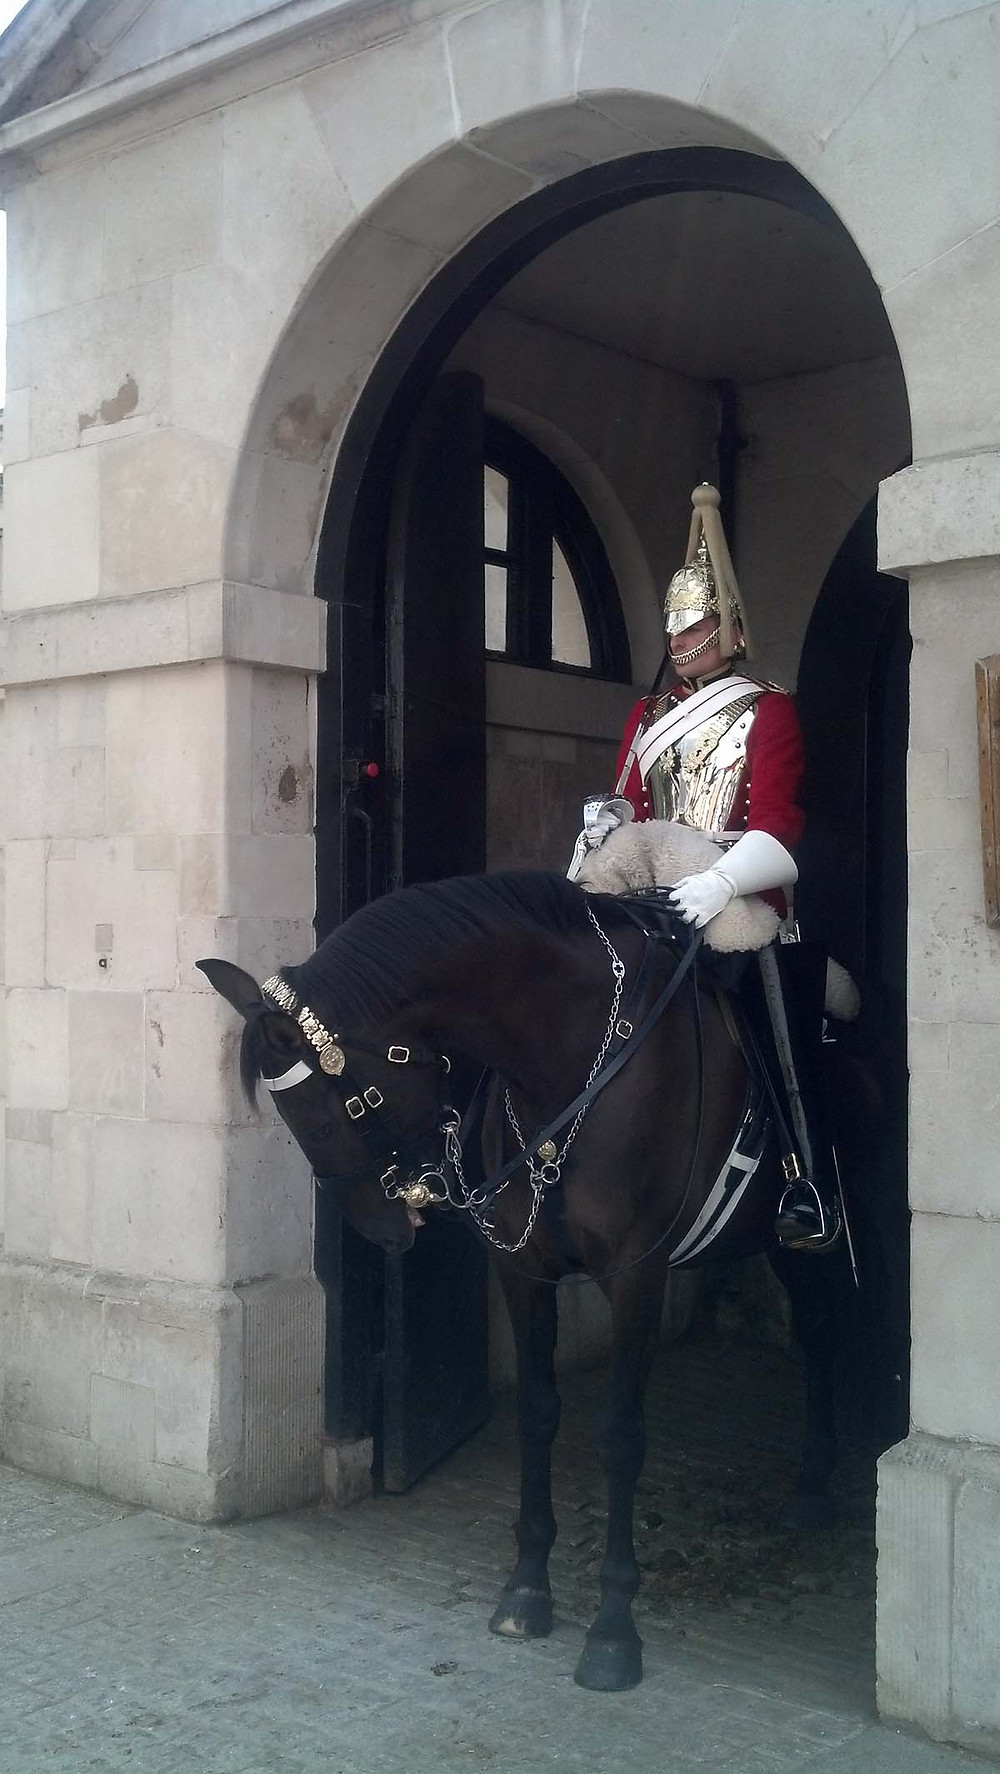 London mounted guard, London, England